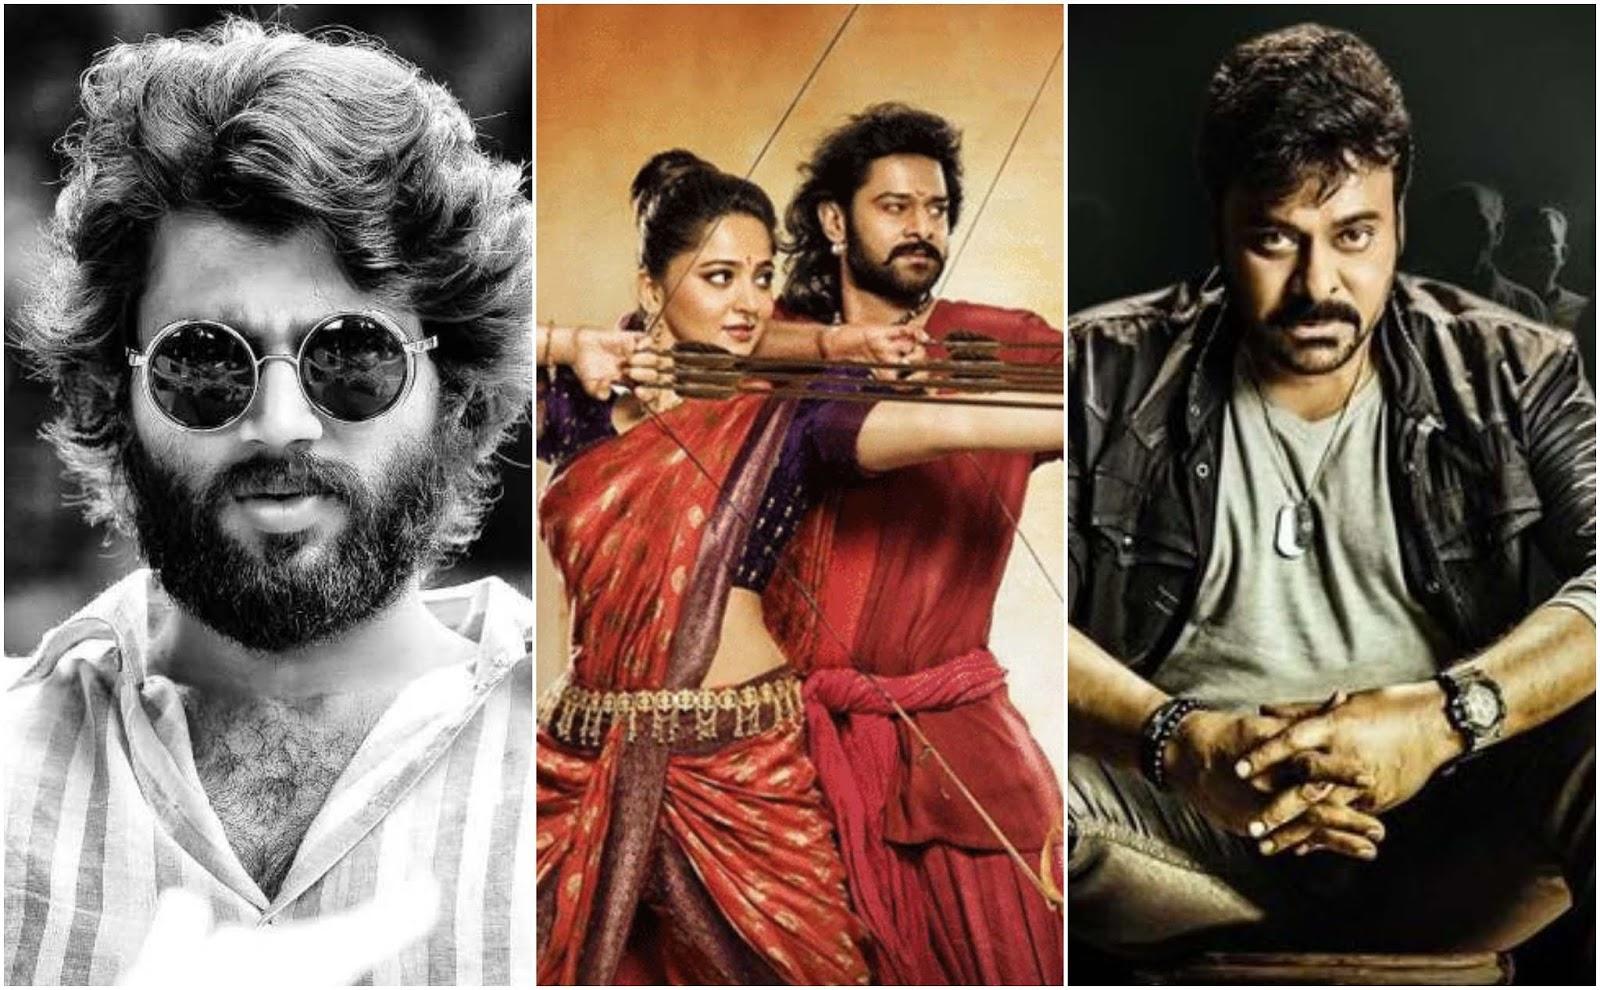 bahubali 2 full hindi movie download 2017